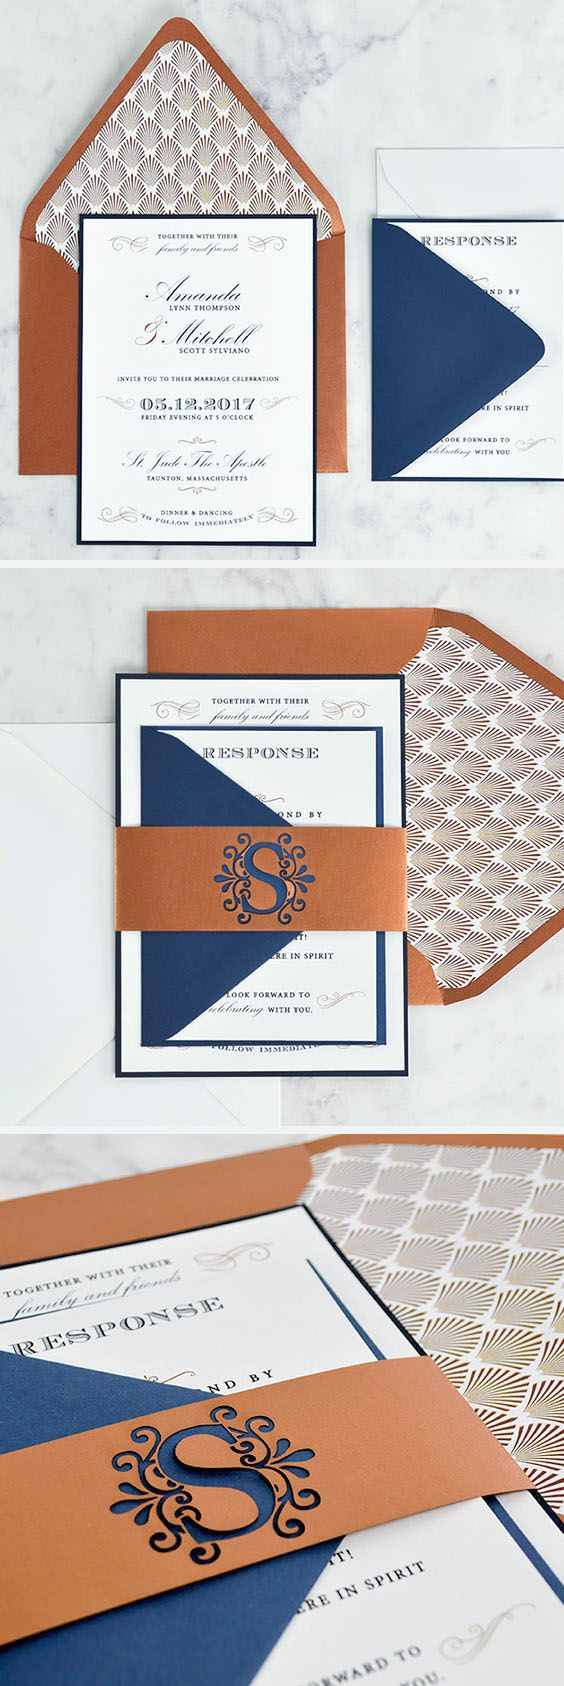 Elegant Dark Blue Copper Wedding Invitation Cards Pockets Design Idea Blog Wedding Invitations Diy Easy Diy Wedding Invitations Wedding Invitations Diy Elegant